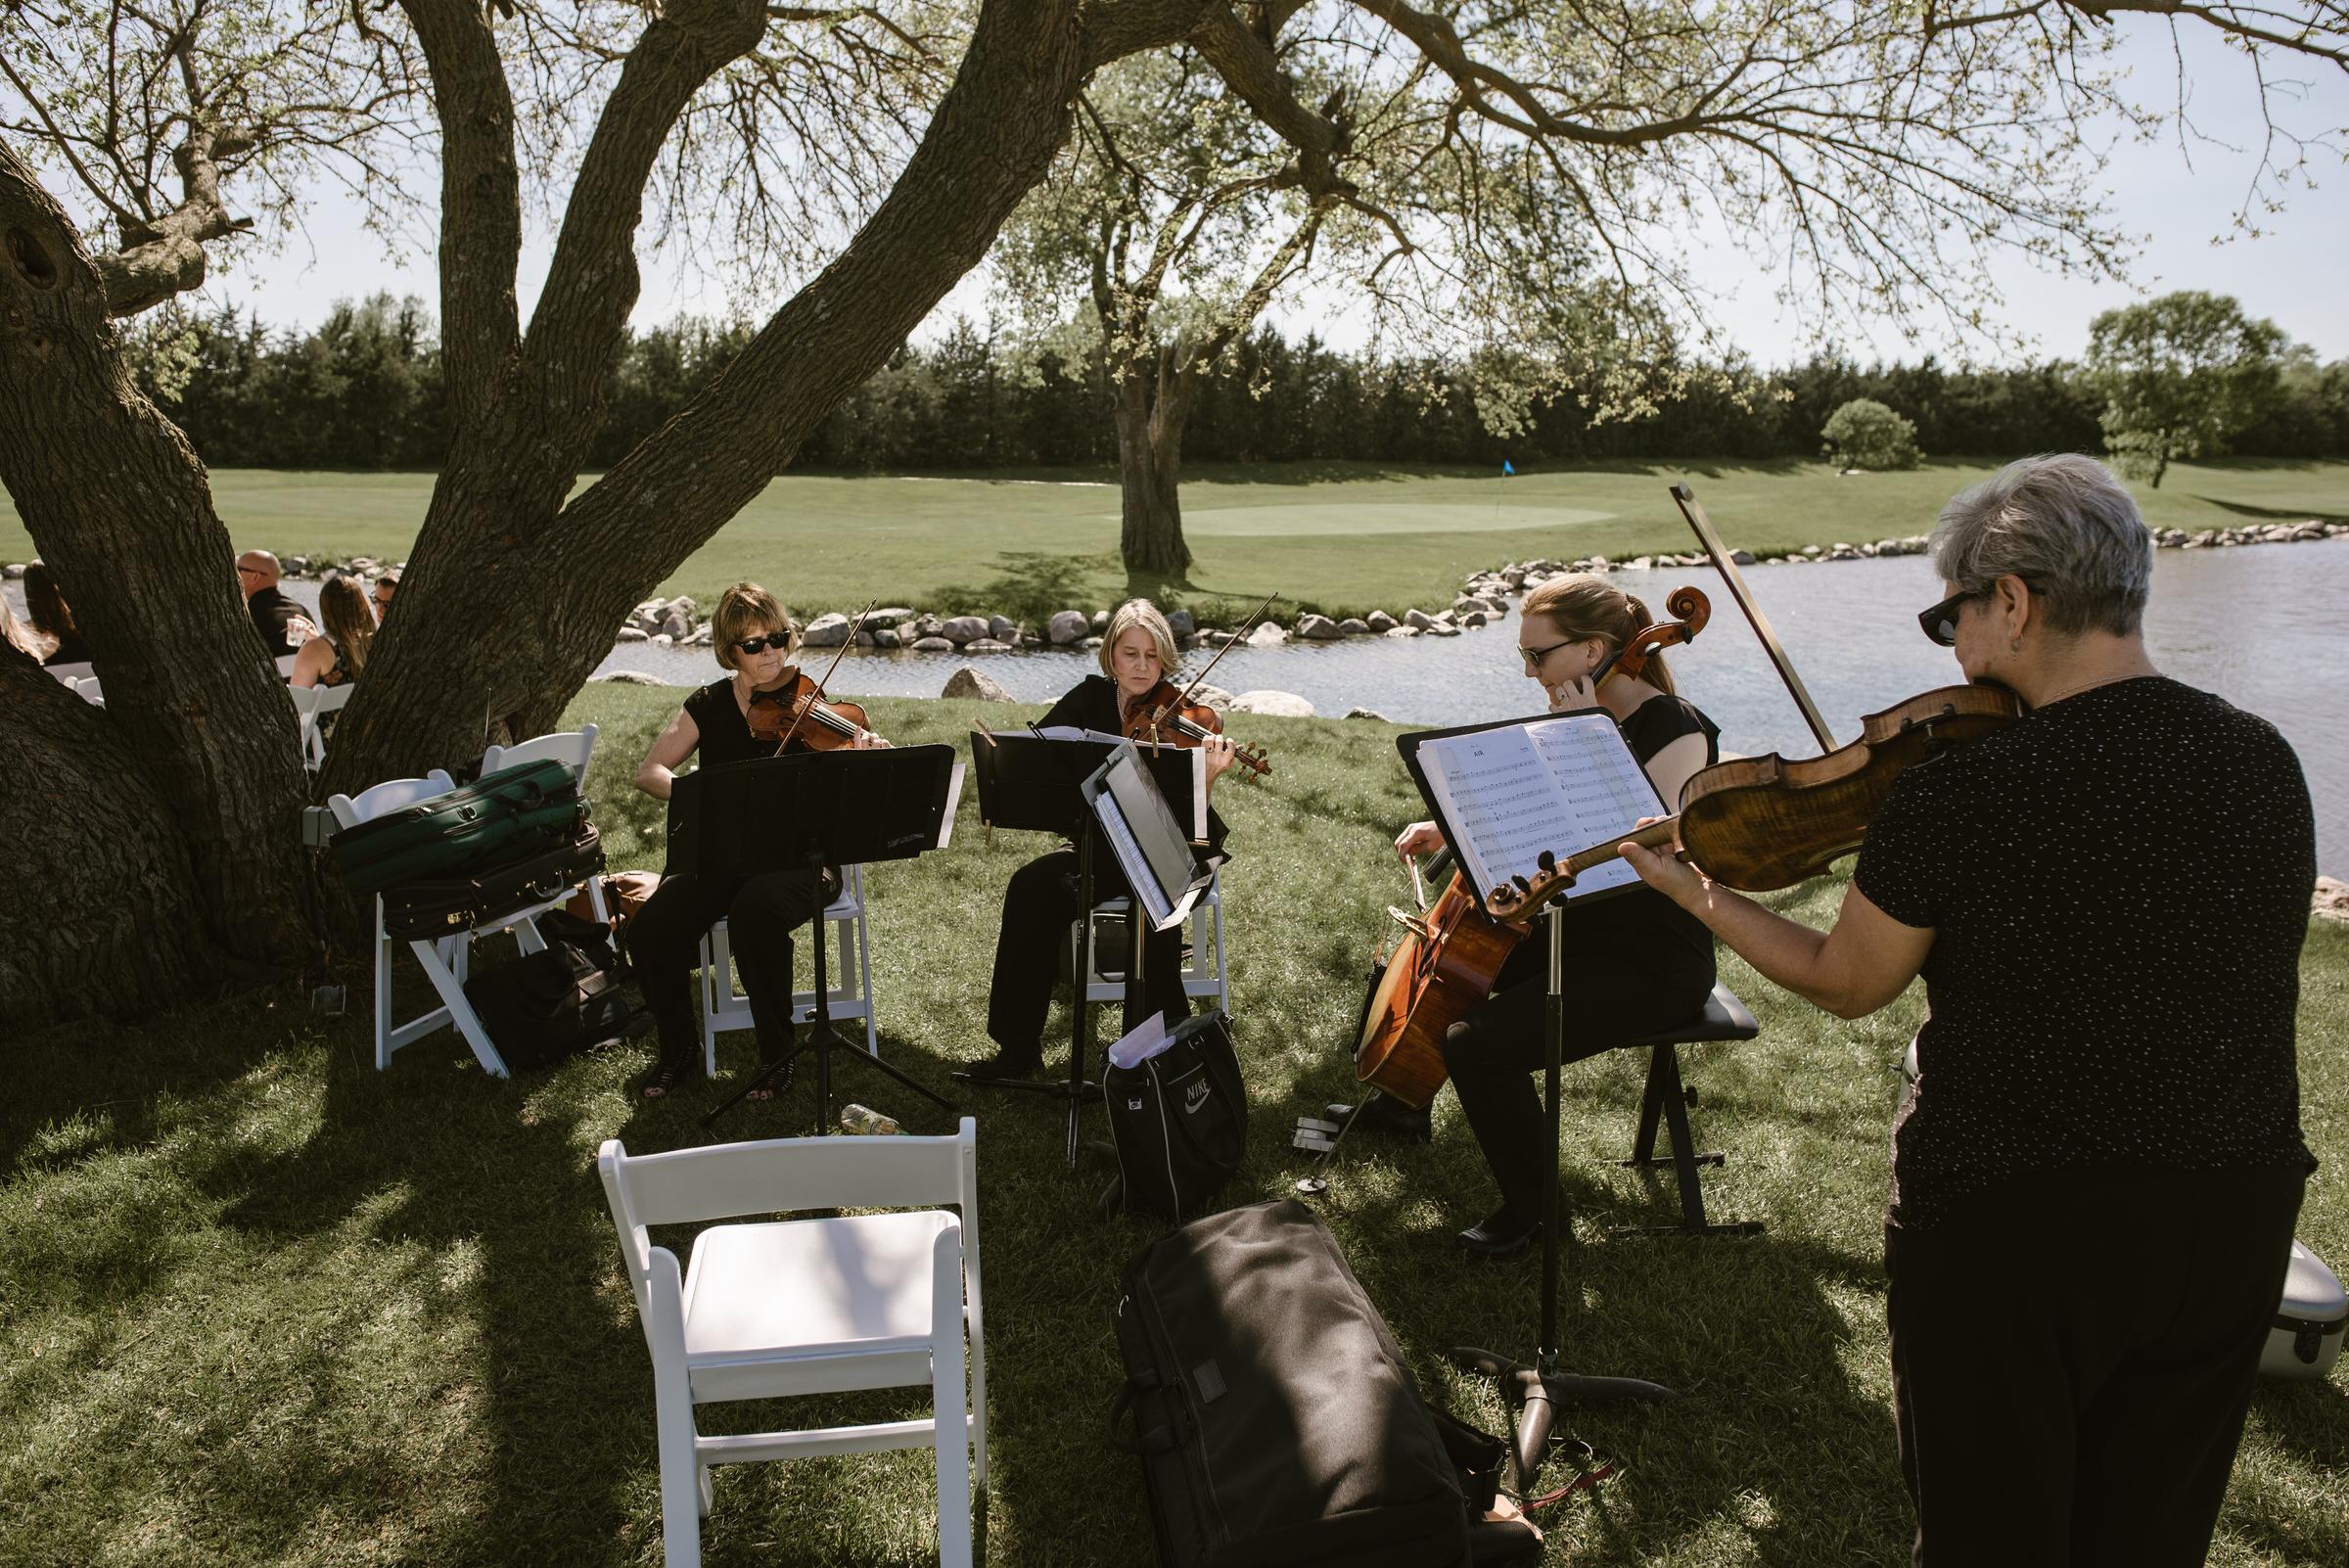 Wilderness-Ridge-Lincoln-Nebraska-Wedding-Kaylie-Sirek-Photography-043.jpg